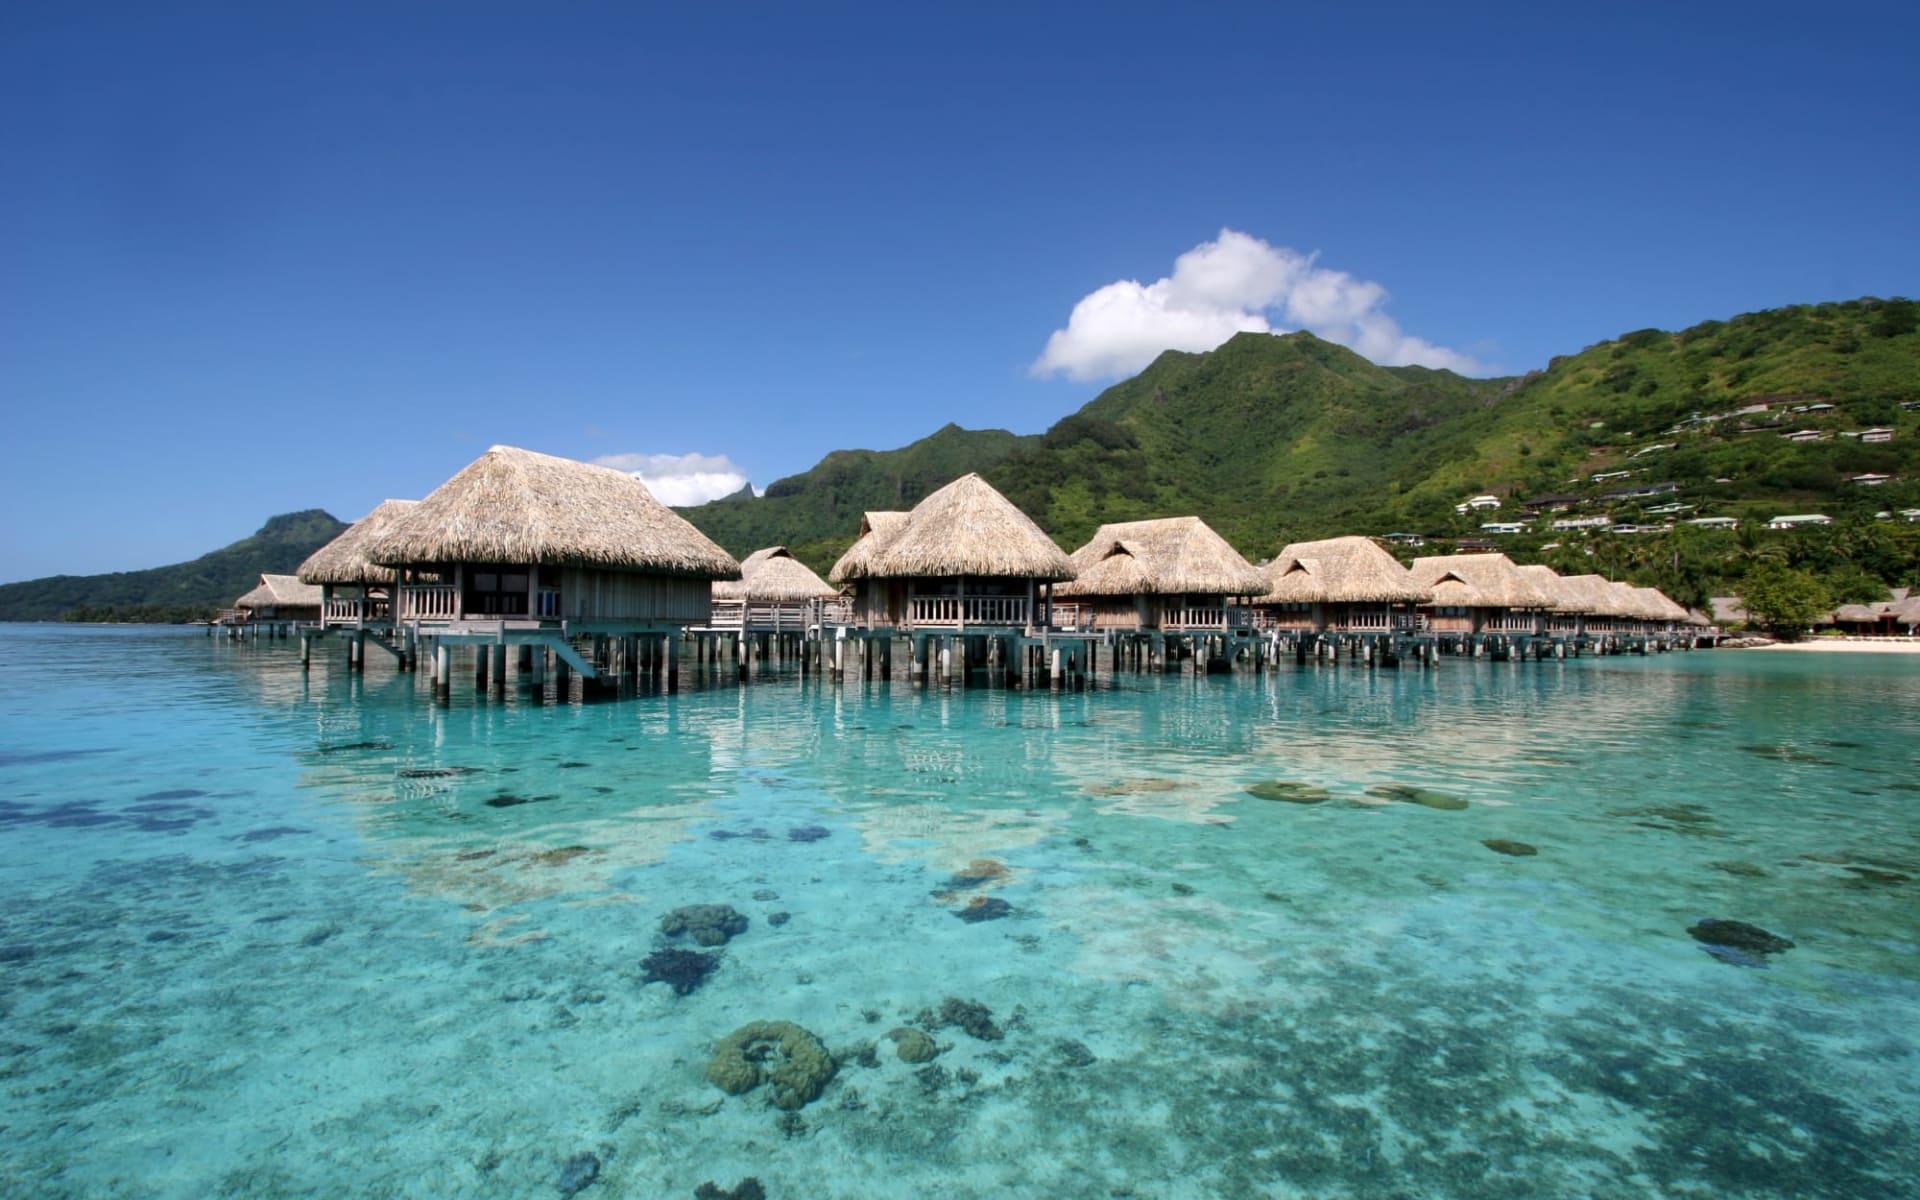 Sofitel Moorea Ia Ora Beach Resort Hotel:  MOZ Sofitel Moorea SUP OW Bungalow1